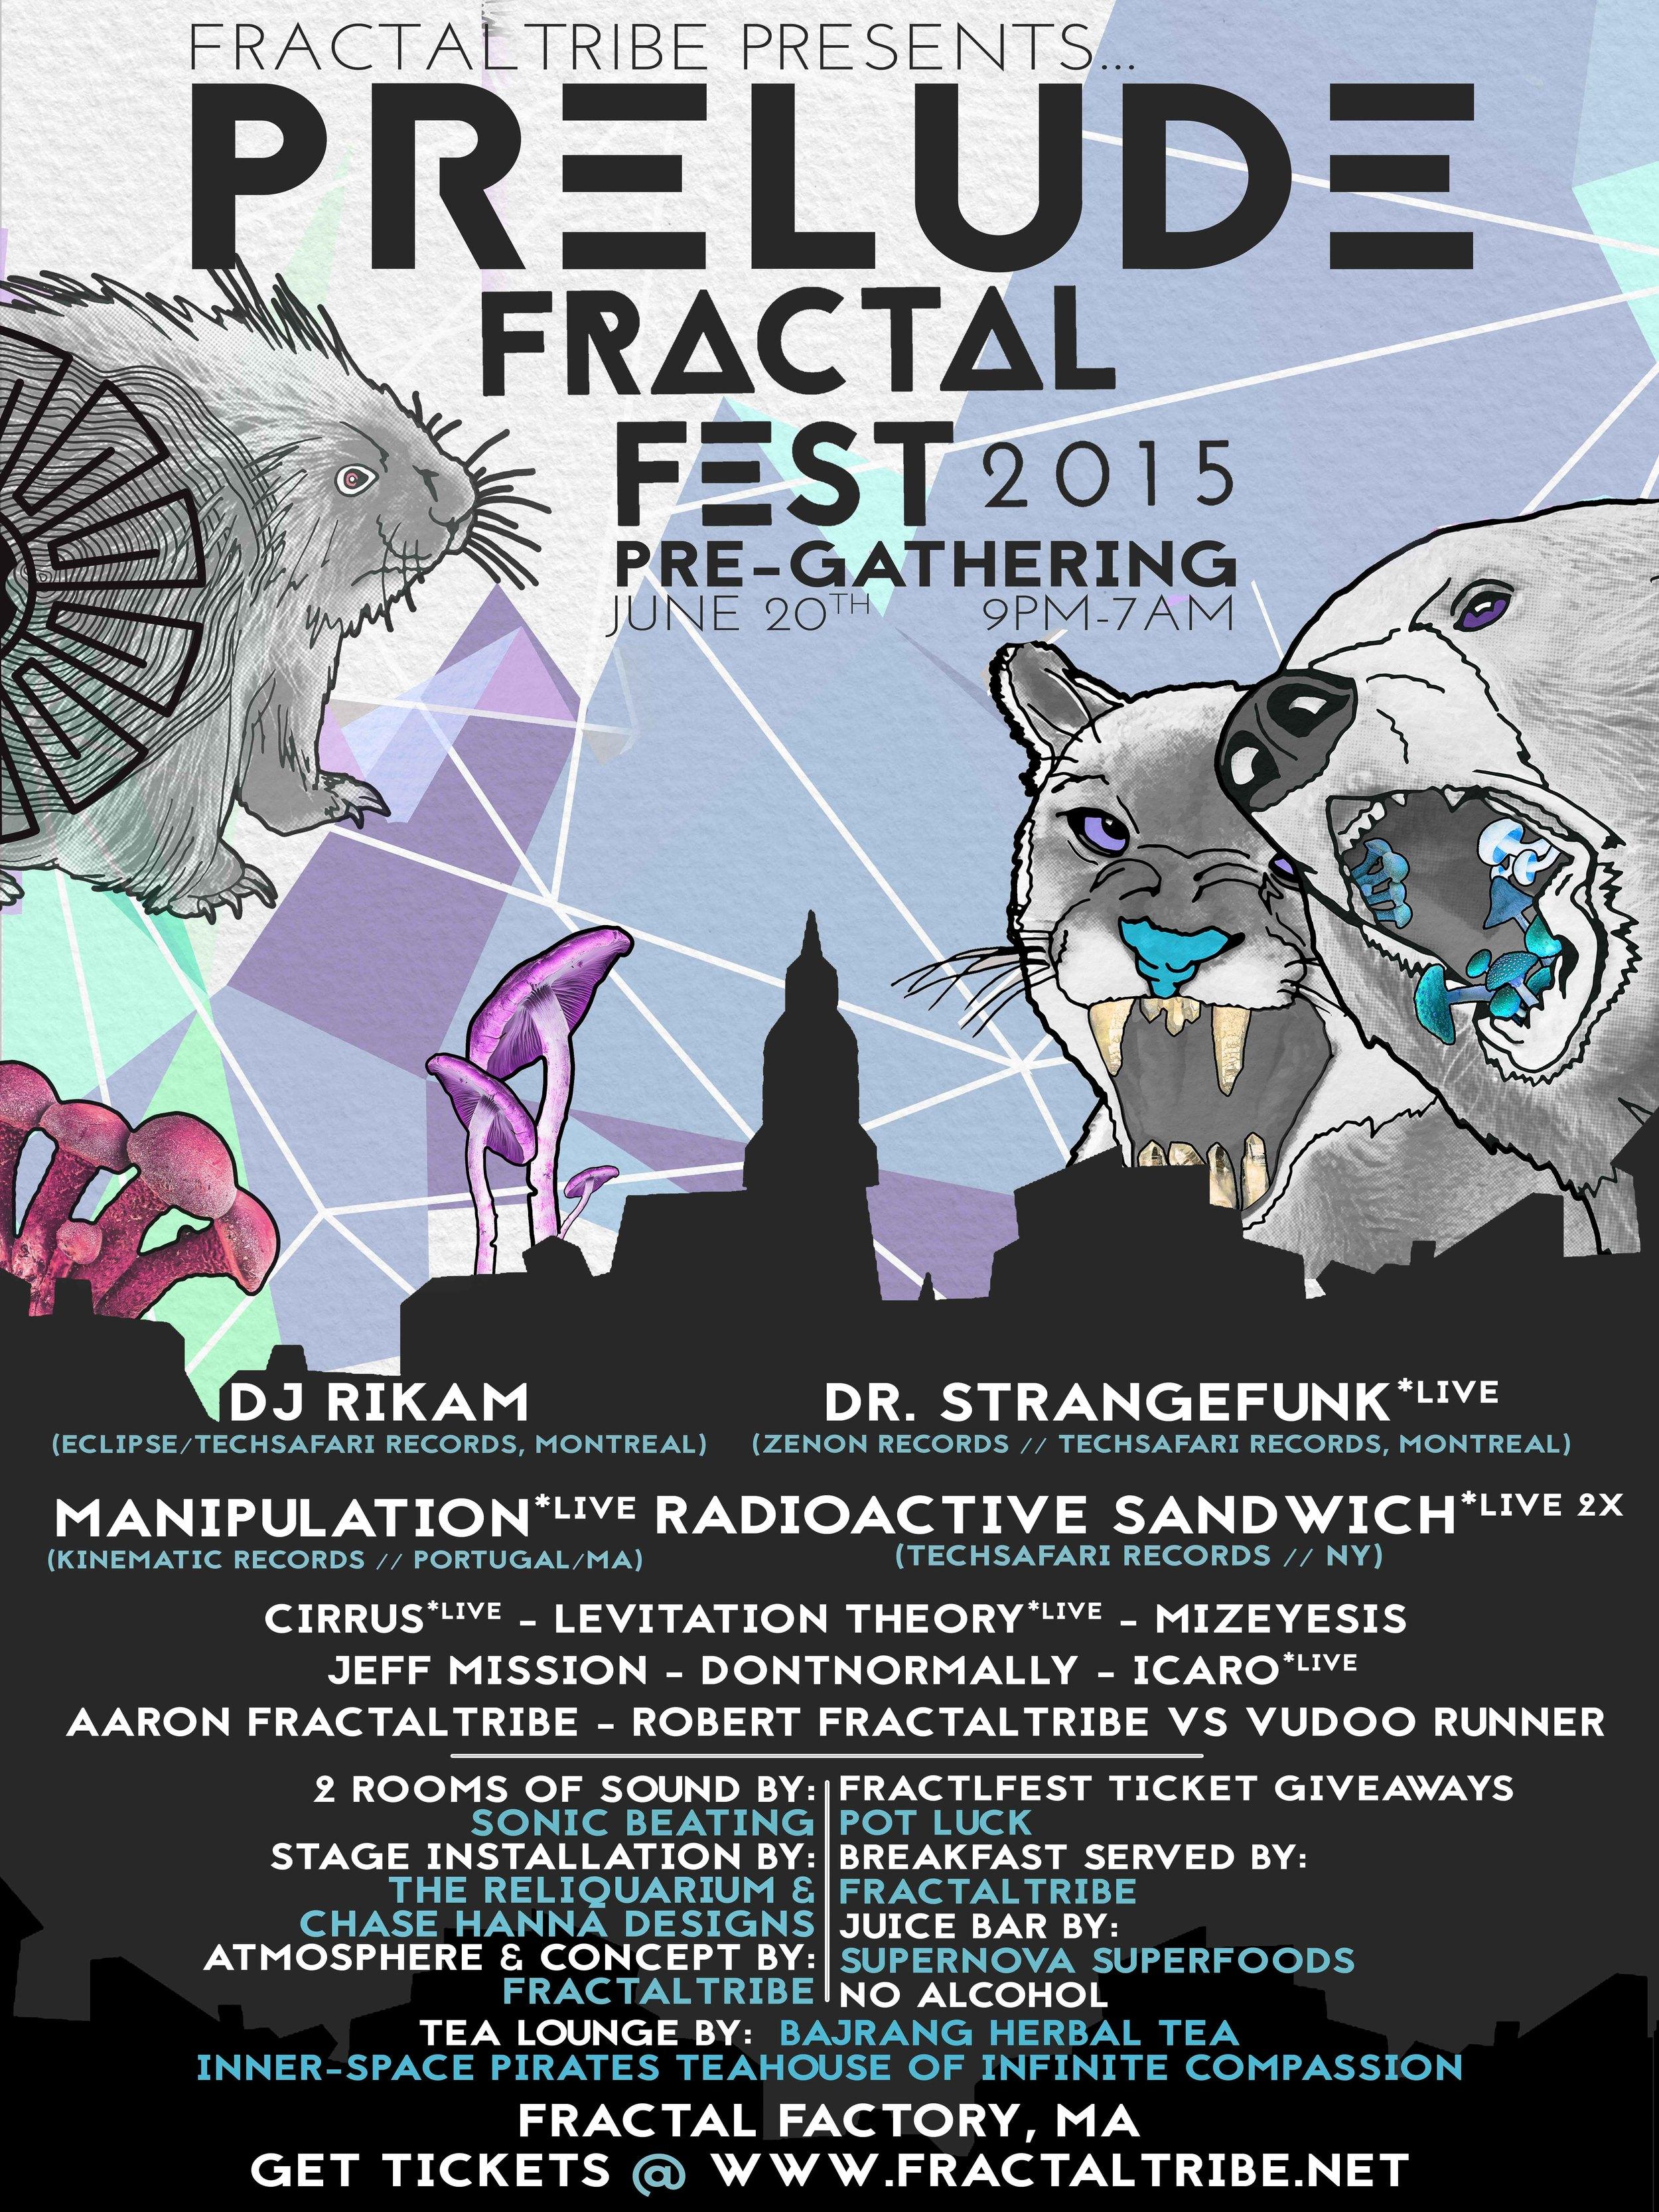 Fractaltribe presents Prelude POSTER.jpg